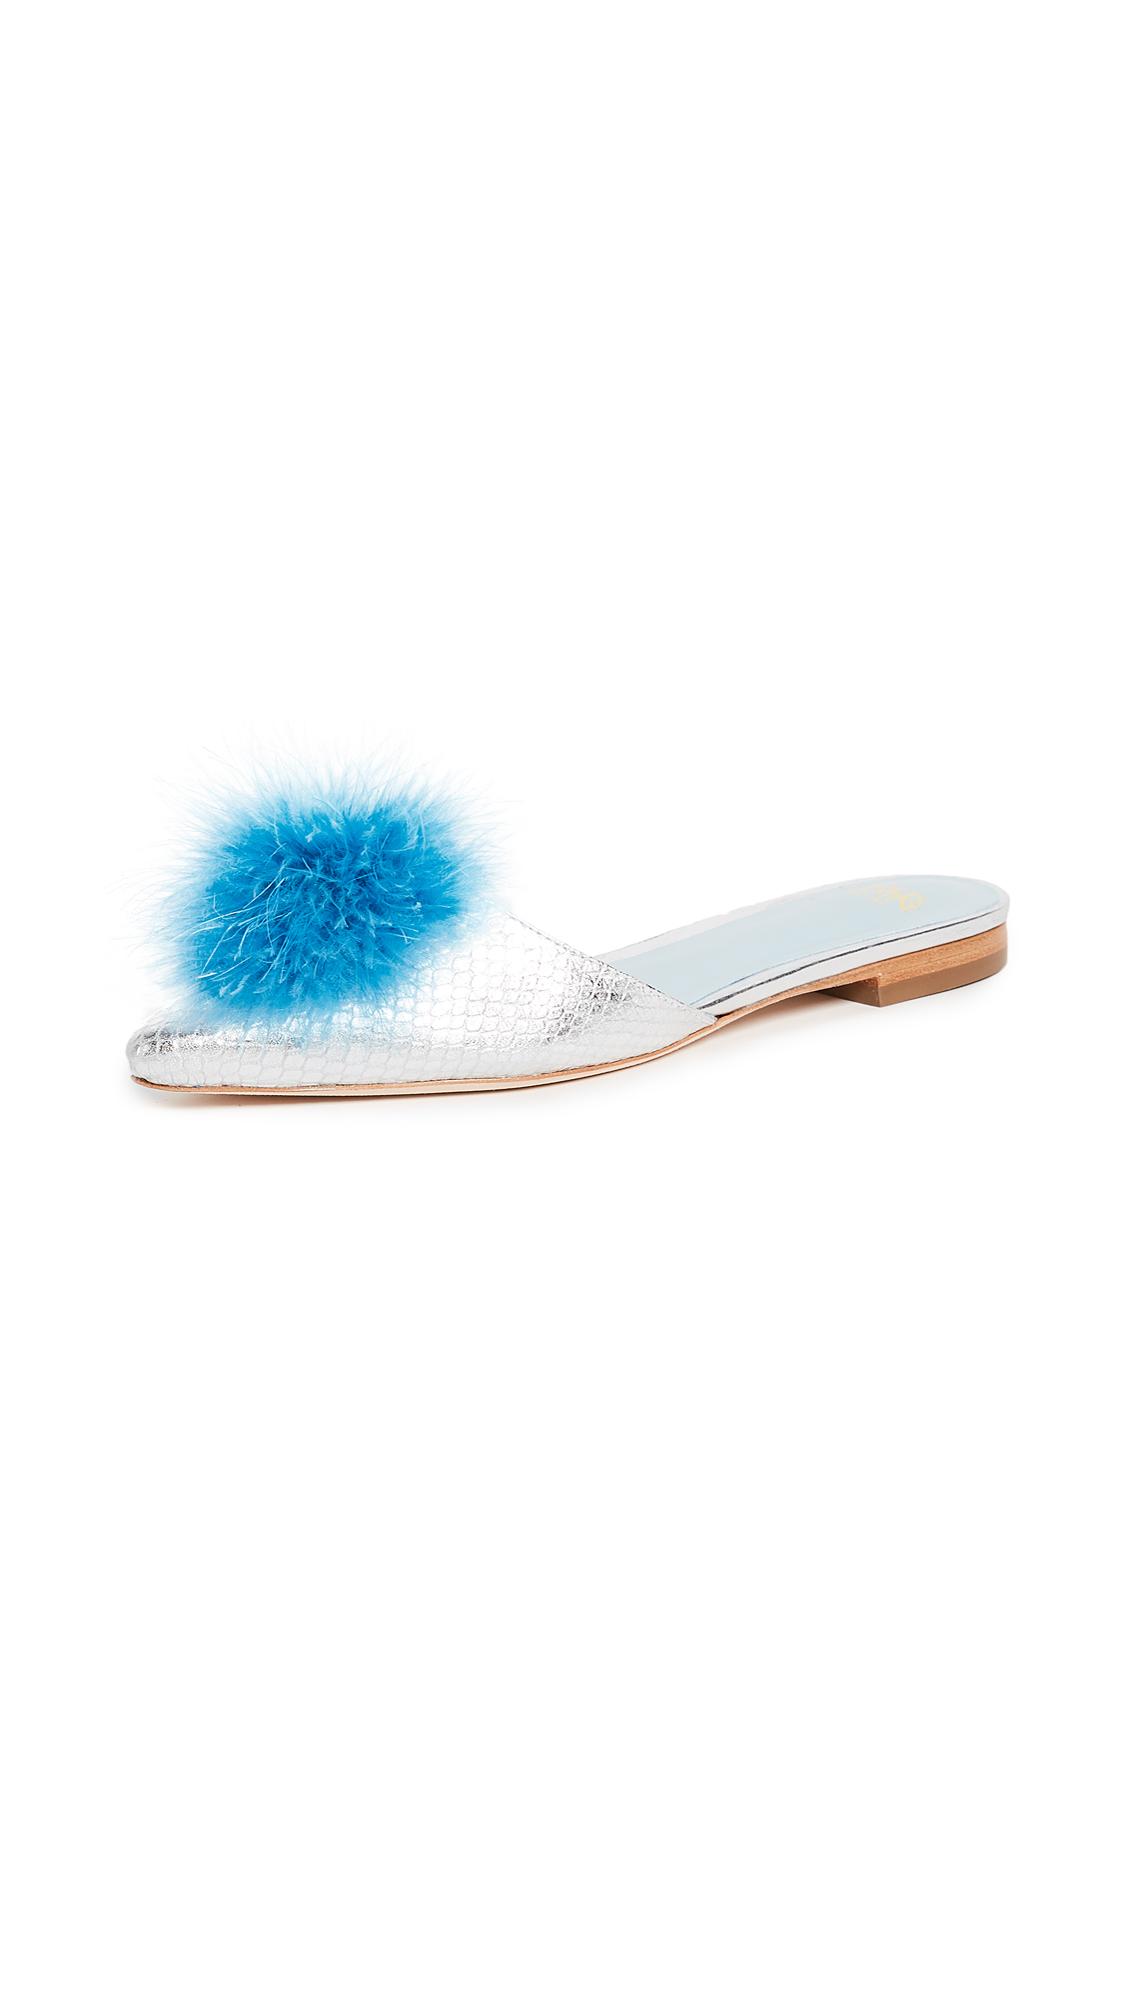 Frances Valentine Pauline Mule Slides - Light Blue